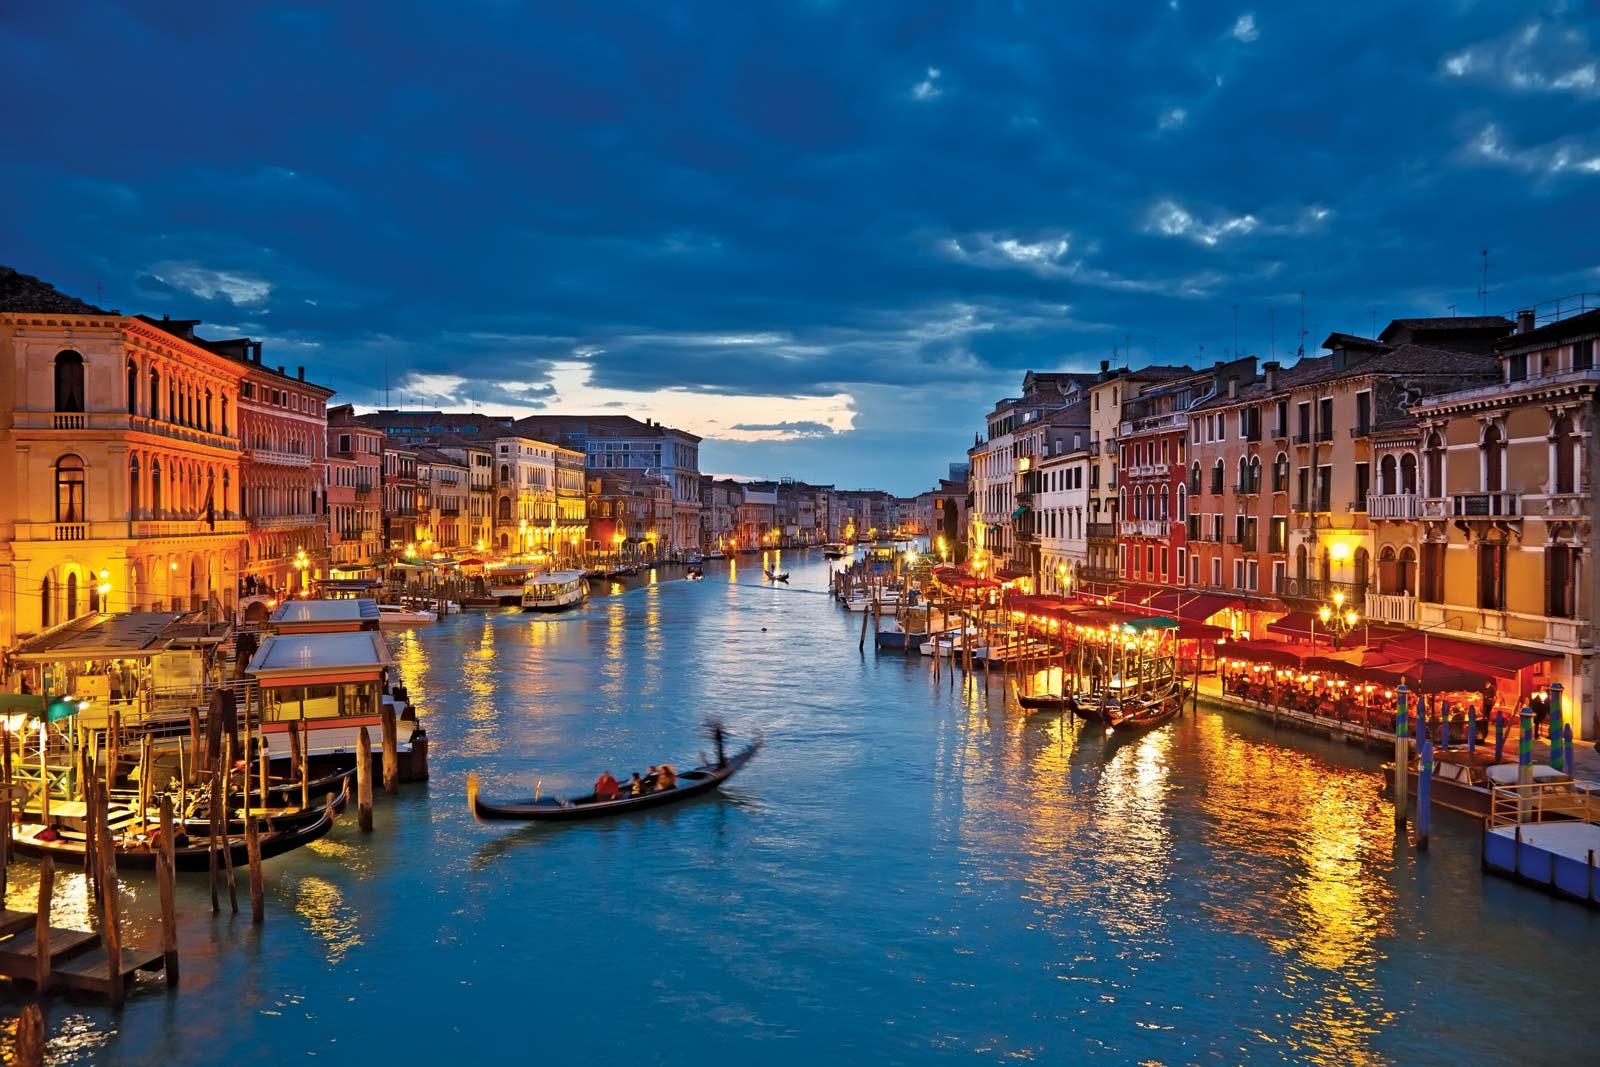 Grand Canal, Venice 1